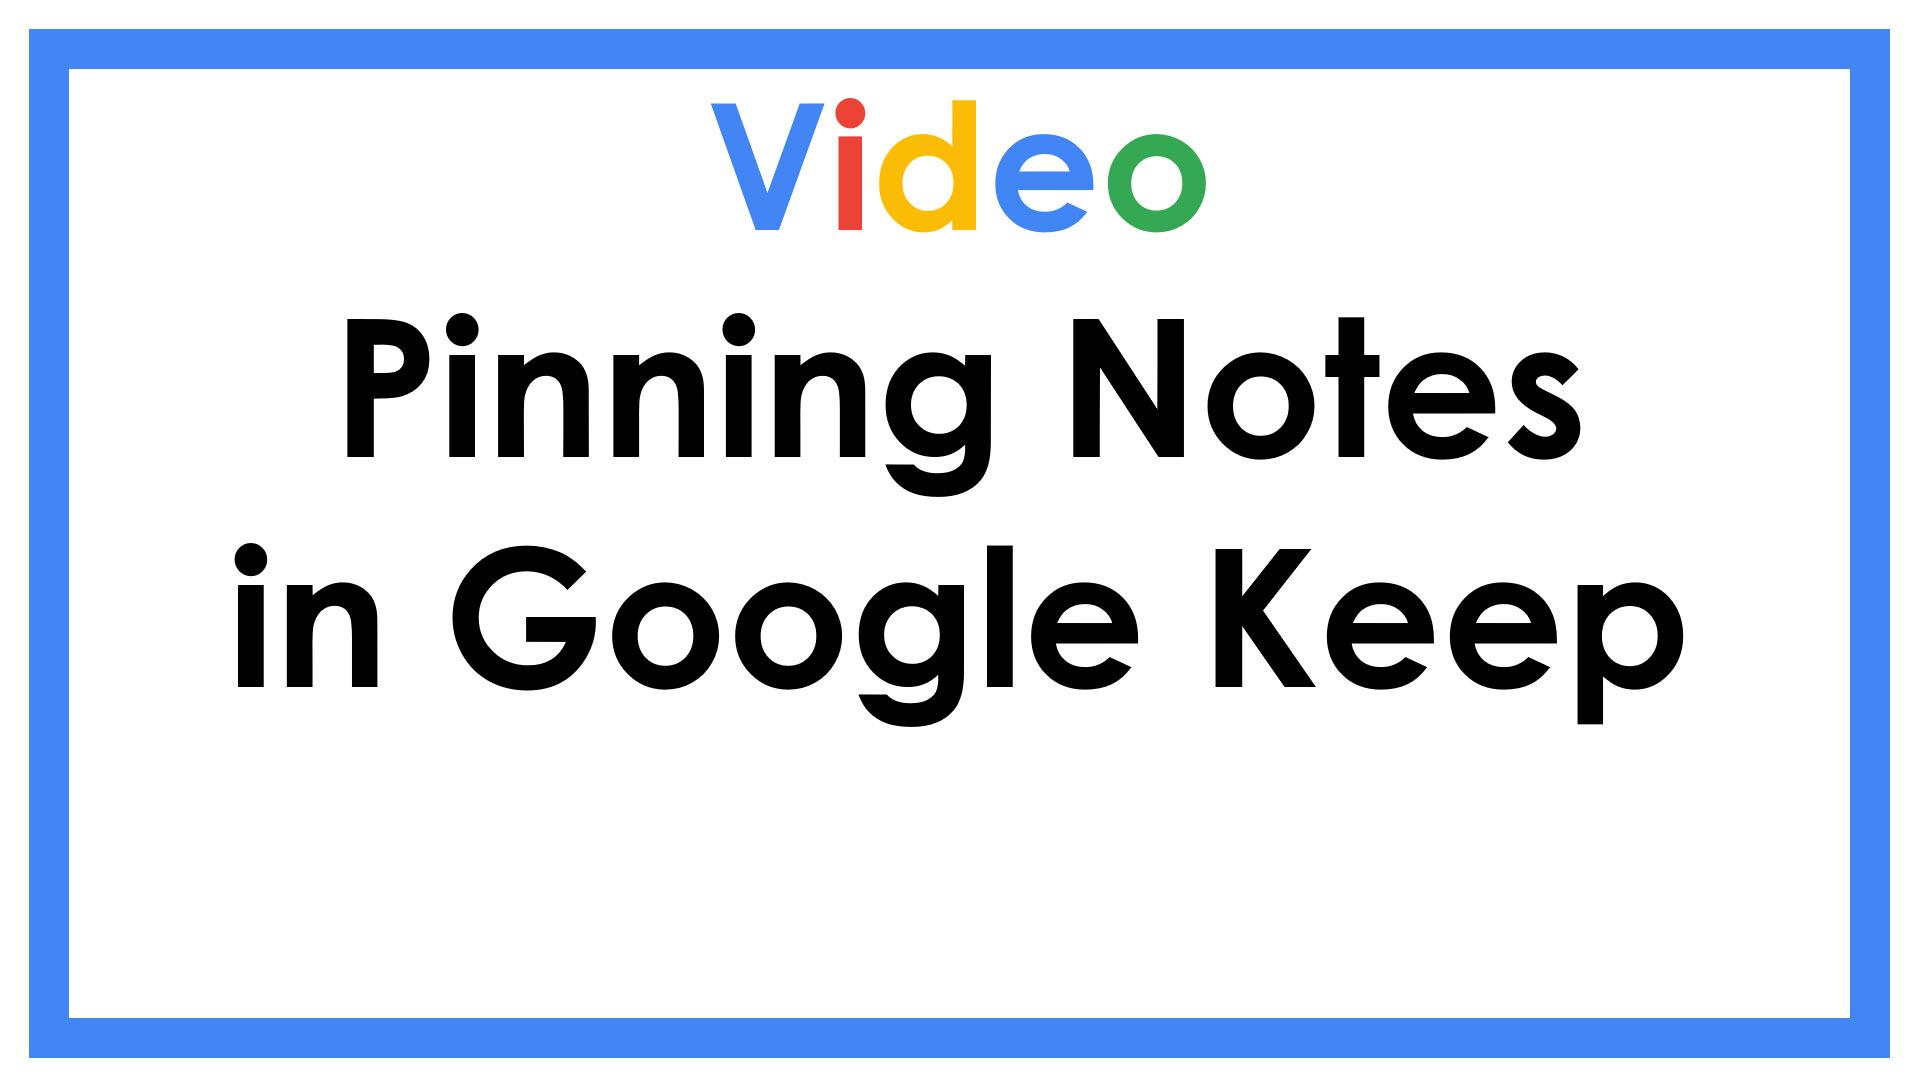 Pinning Notes in Google Keep